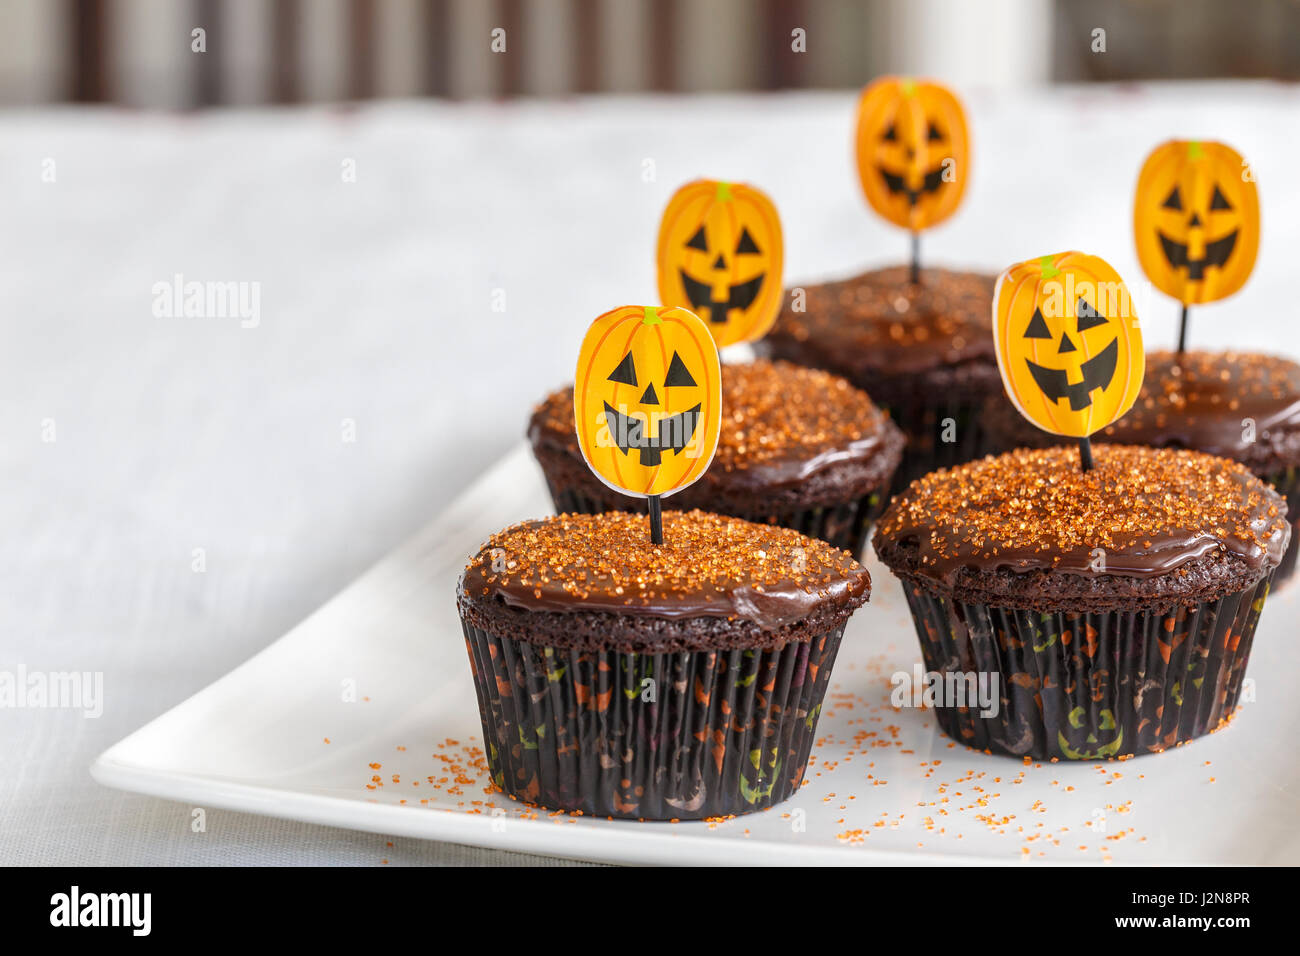 Chocolate Halloween cupcakes with orange decorations - Stock Image